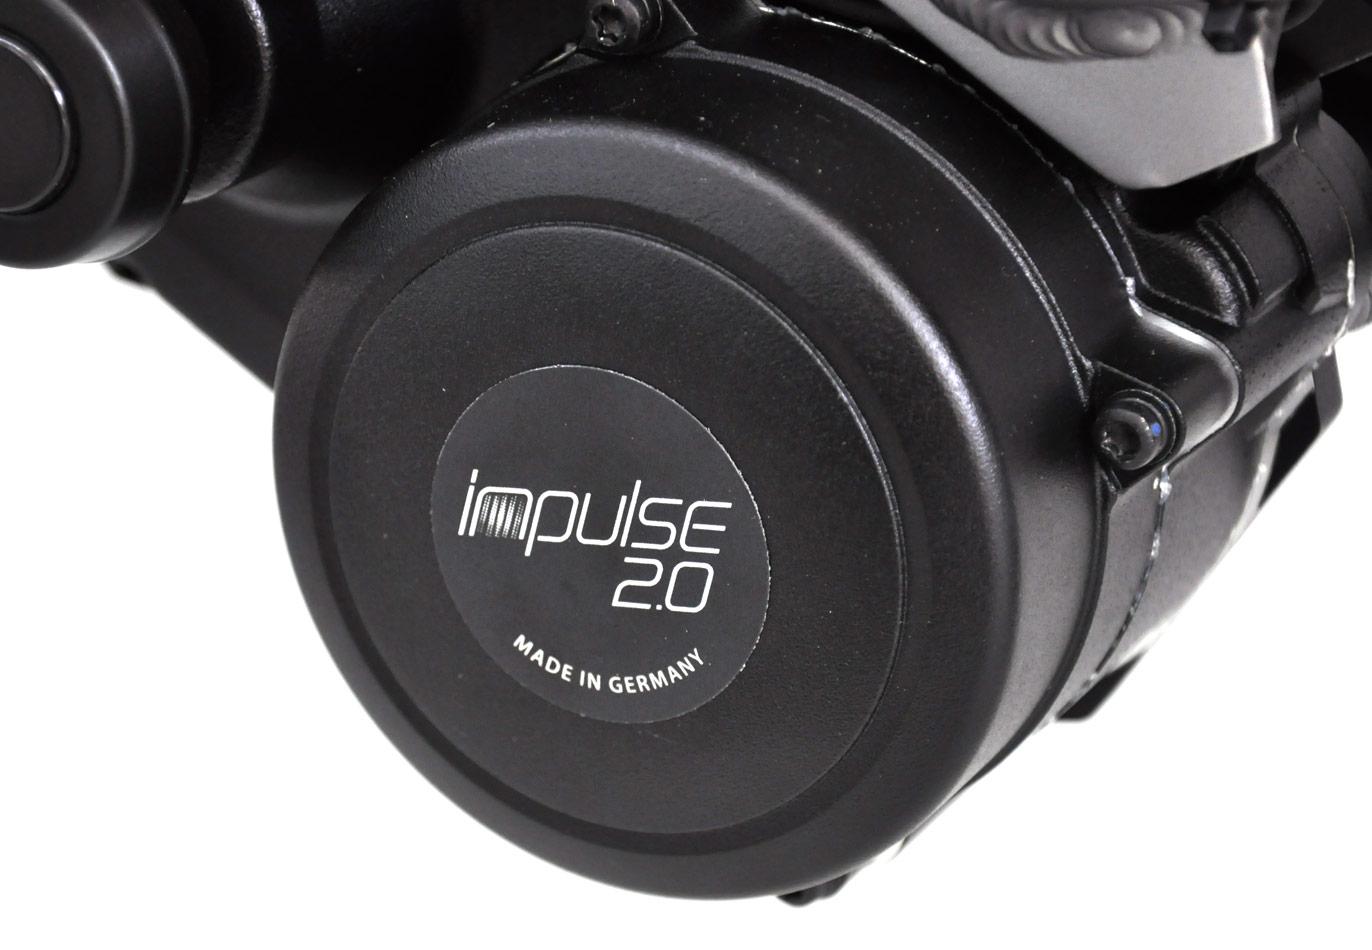 moteur Impulse 2.0